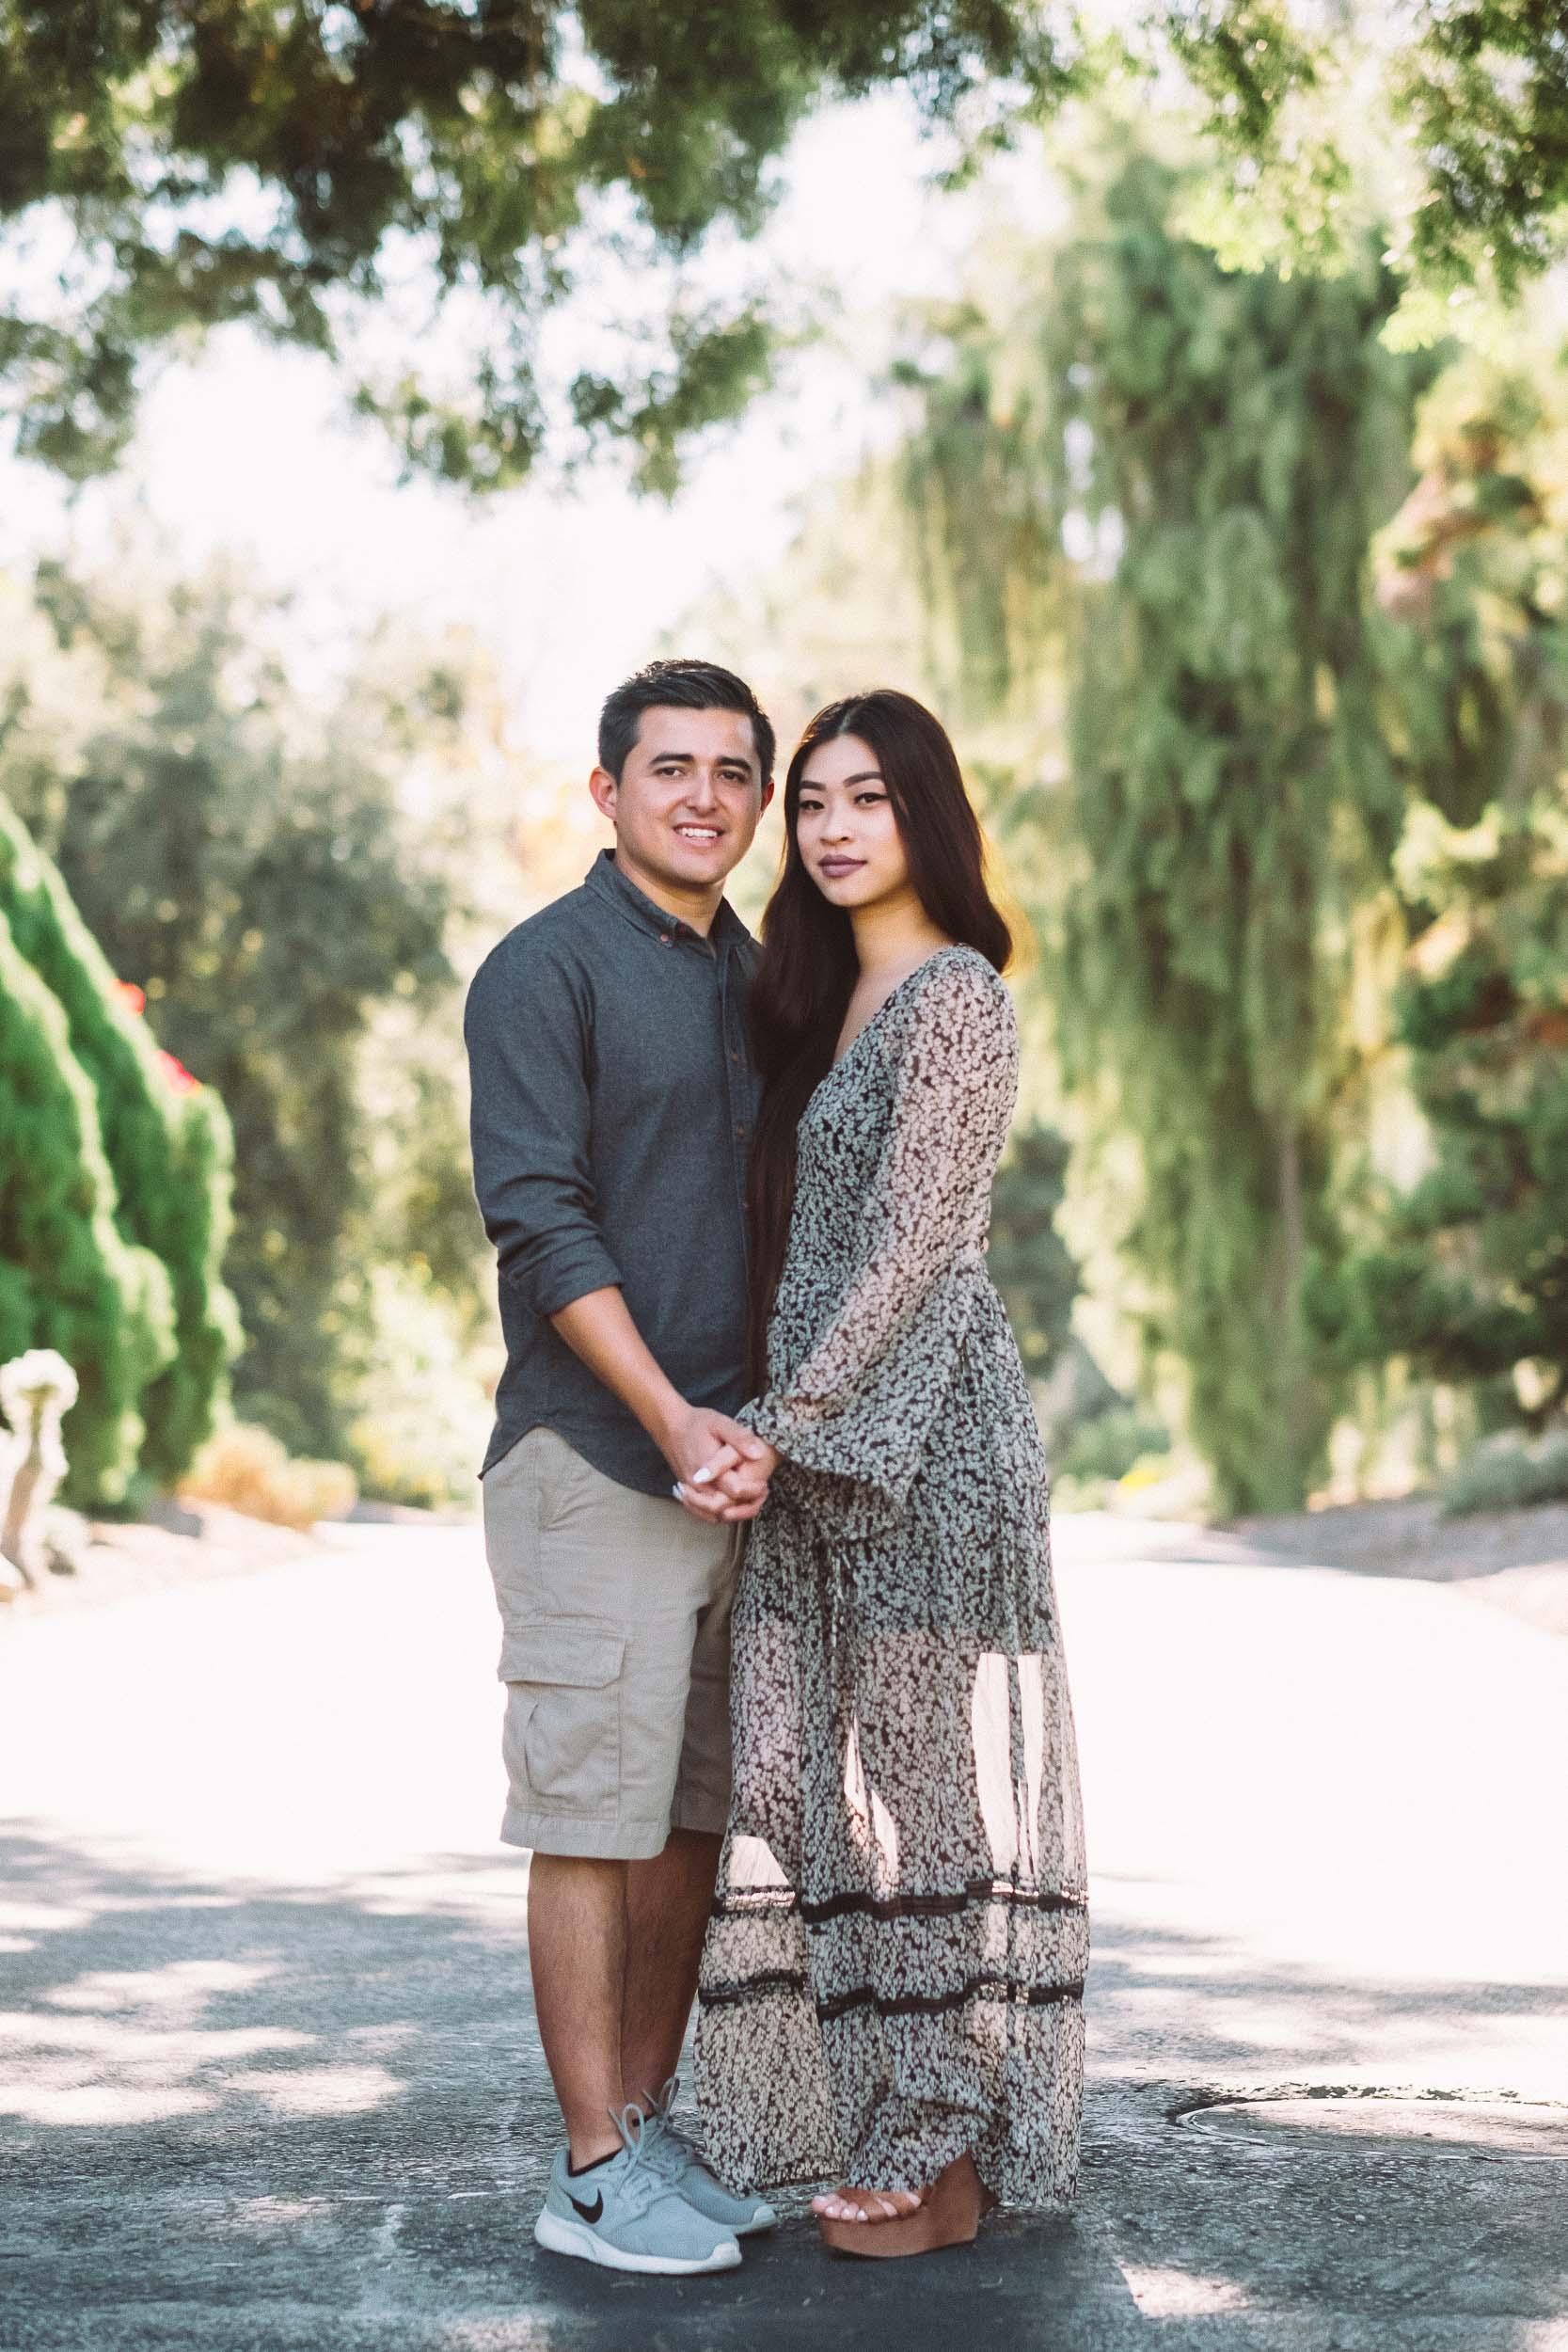 Bryan-Miraflor-Photography-Suzie-Victor-Engagement-Los-Angeles-Arboretum-20151121-0022.jpg